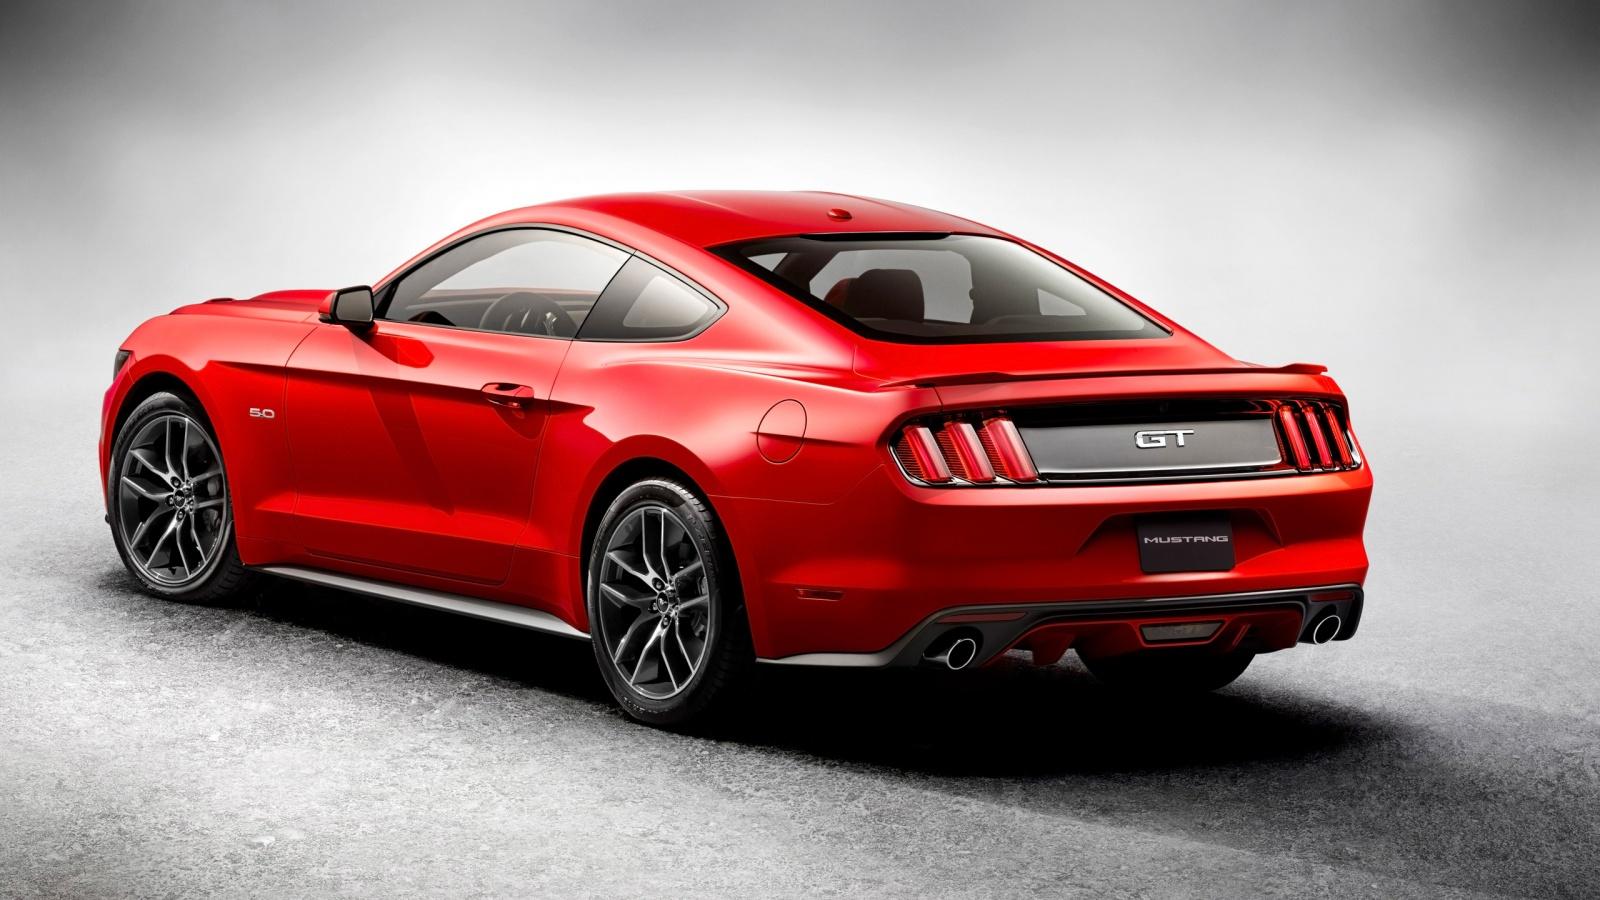 2015 Ford Mustang 3 Wallpaper HD Car Wallpapers 1600x900